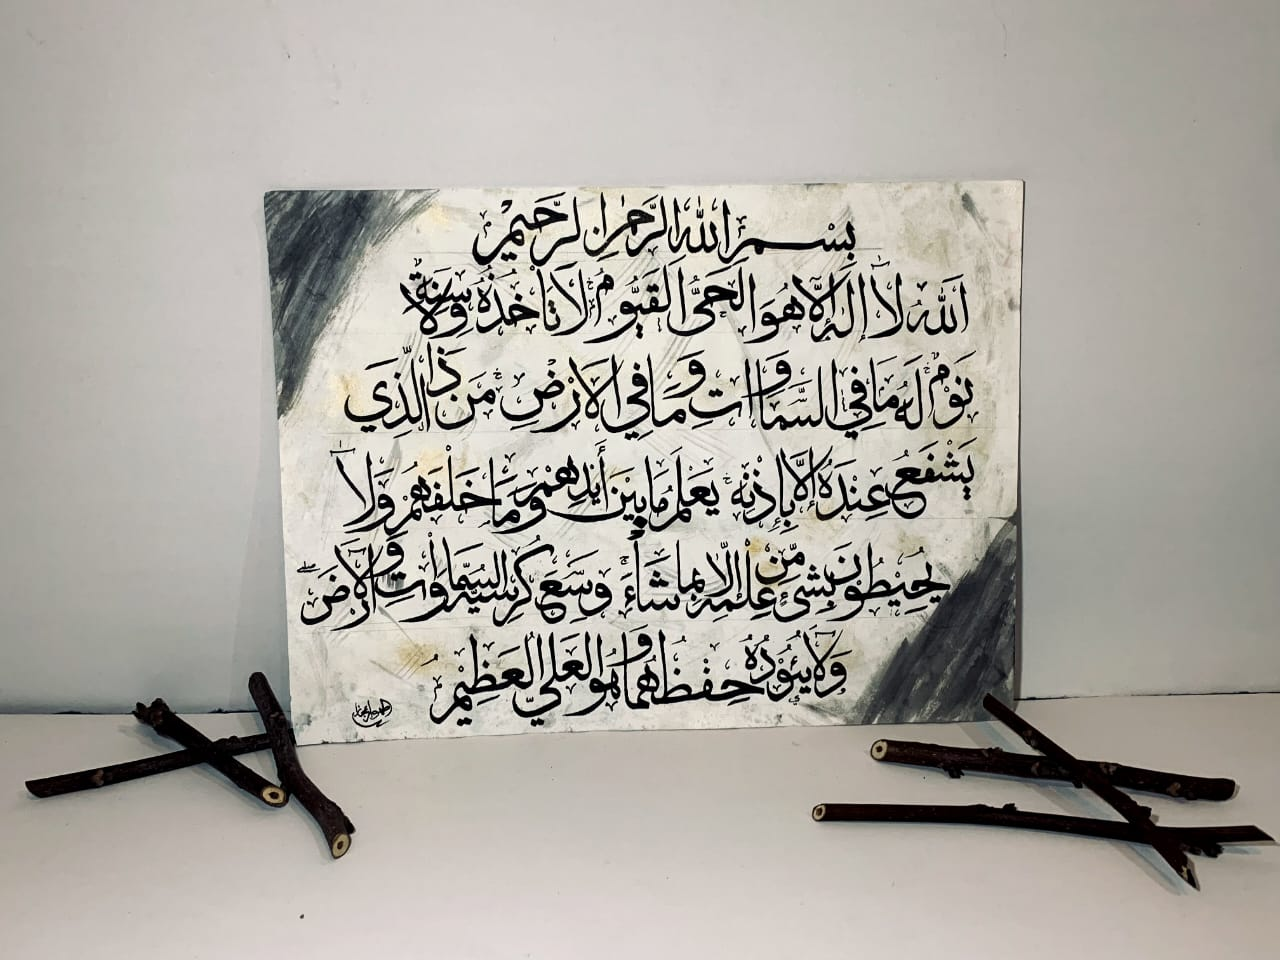 Tahoor Ajaz: An Aspiring Calligraphy Artist from Rainawari, Kashmir